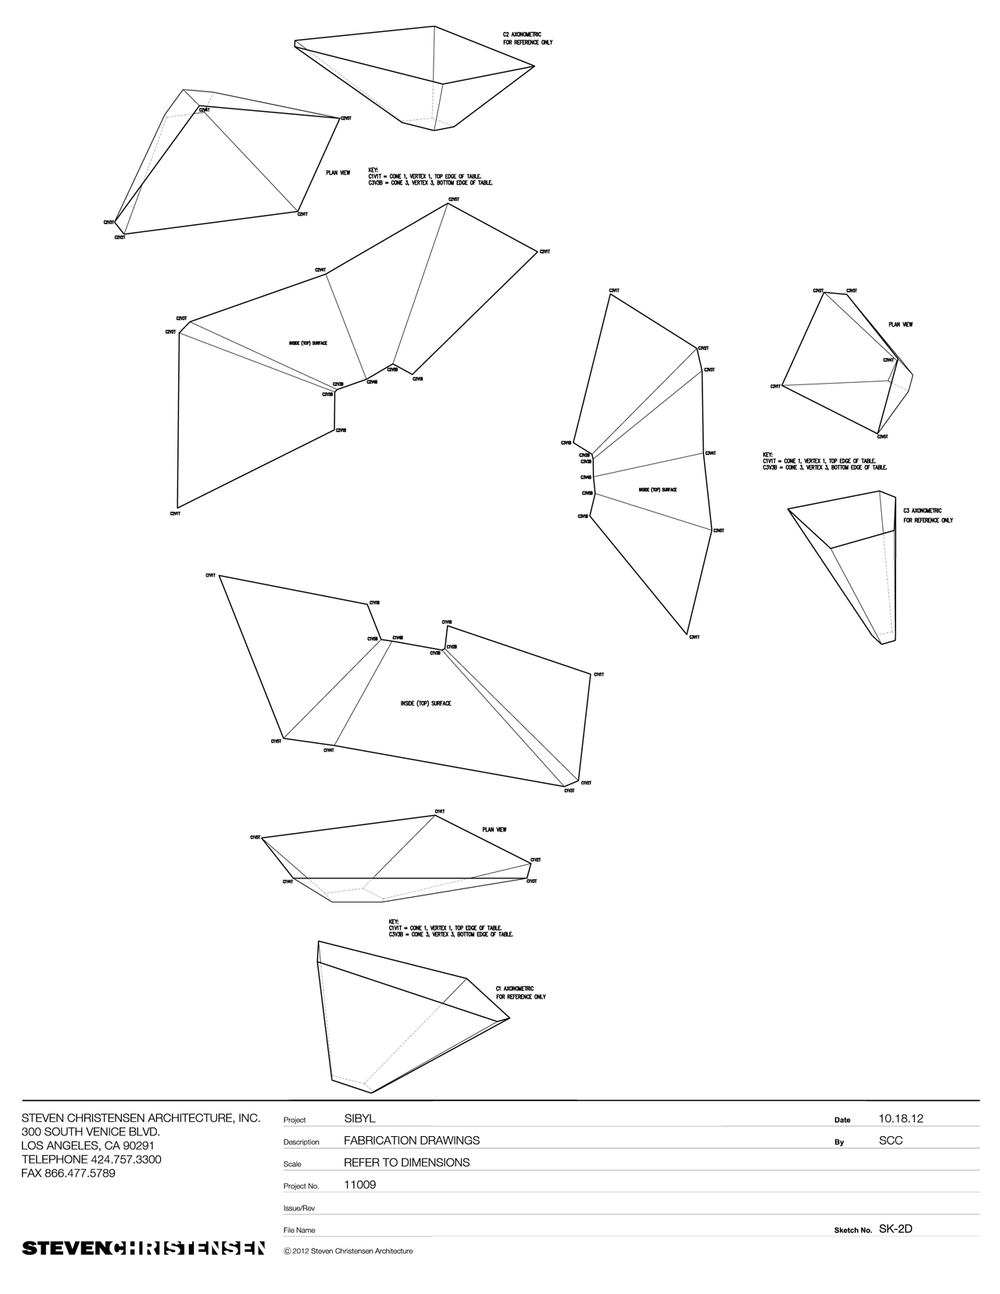 steven-christensen_sibyl_fabrication-drawings_2D_1280.png